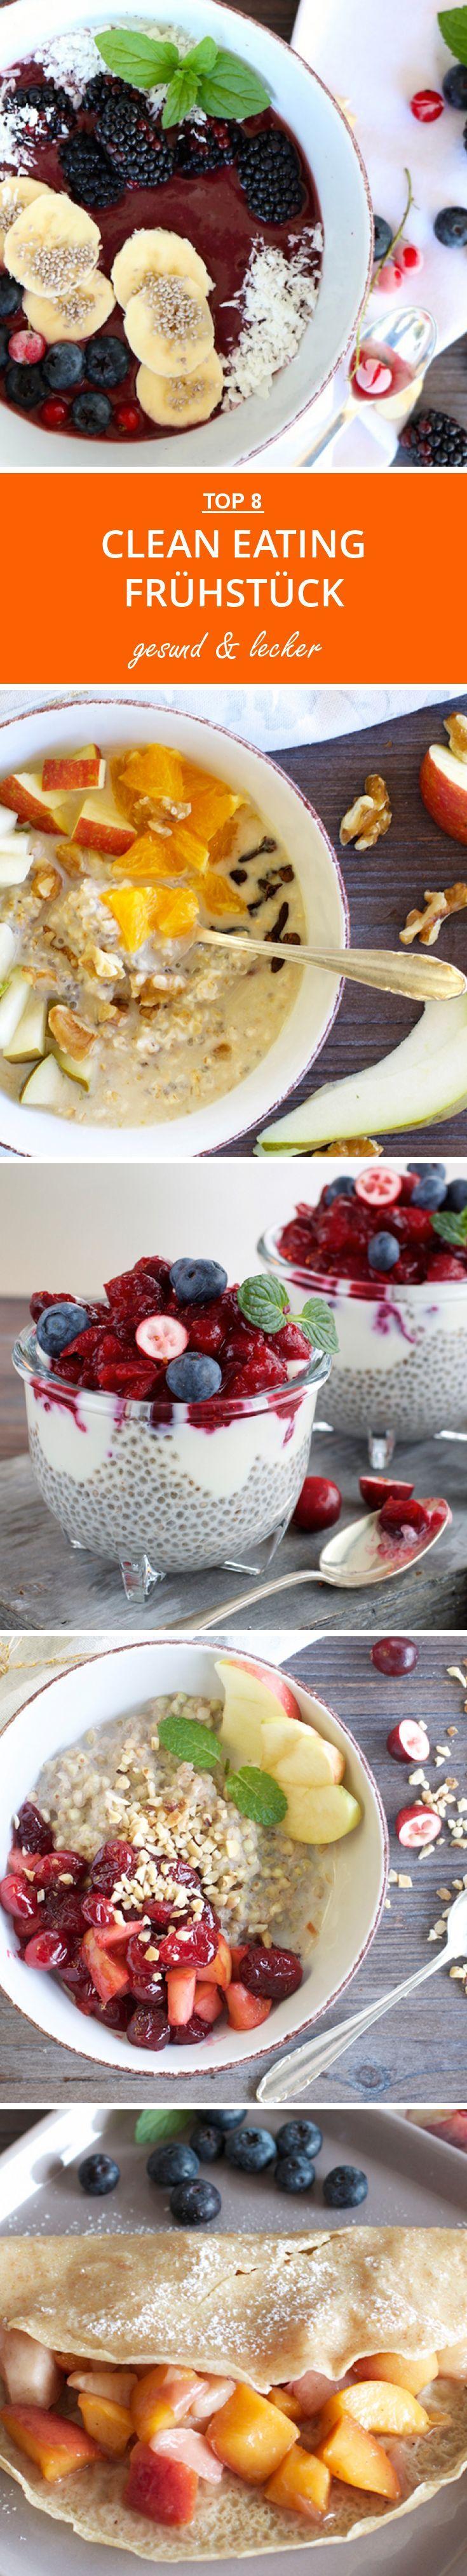 Sauberes Essen Frühstück   eatsmarter.de   – Frühstück